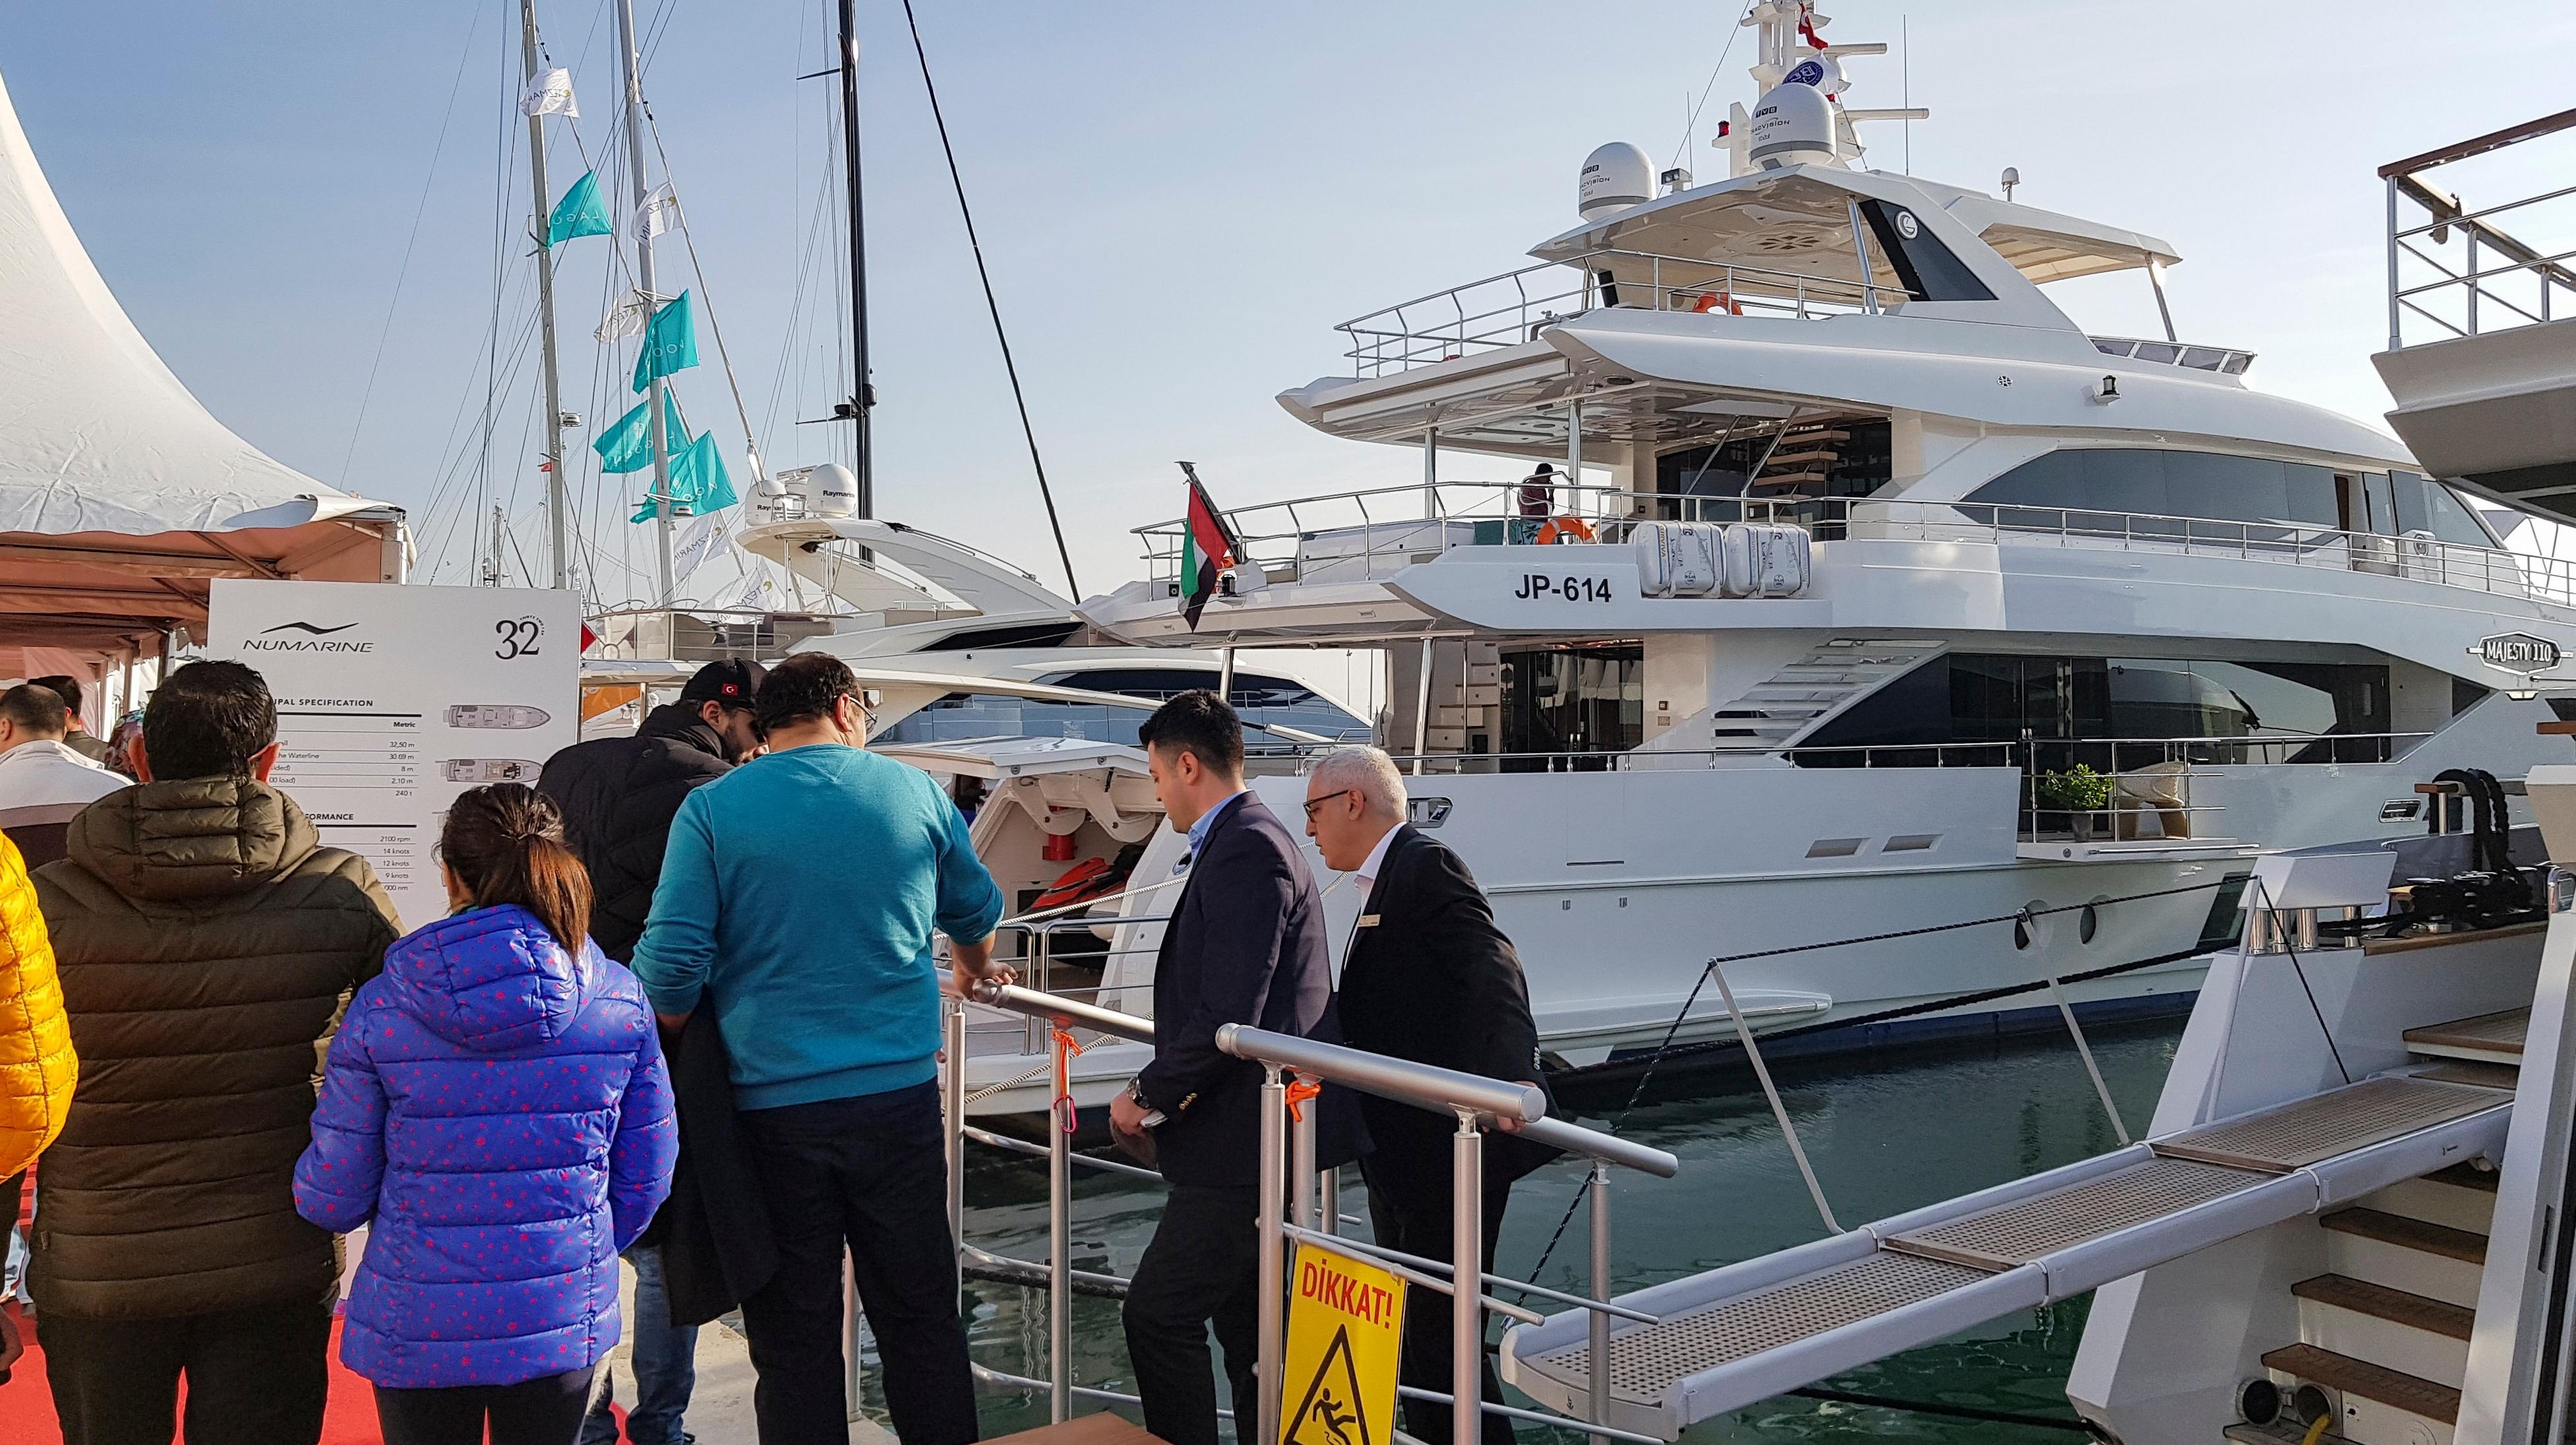 Gulf Craft at Tuzla Boat Show 2018 (6).jpg